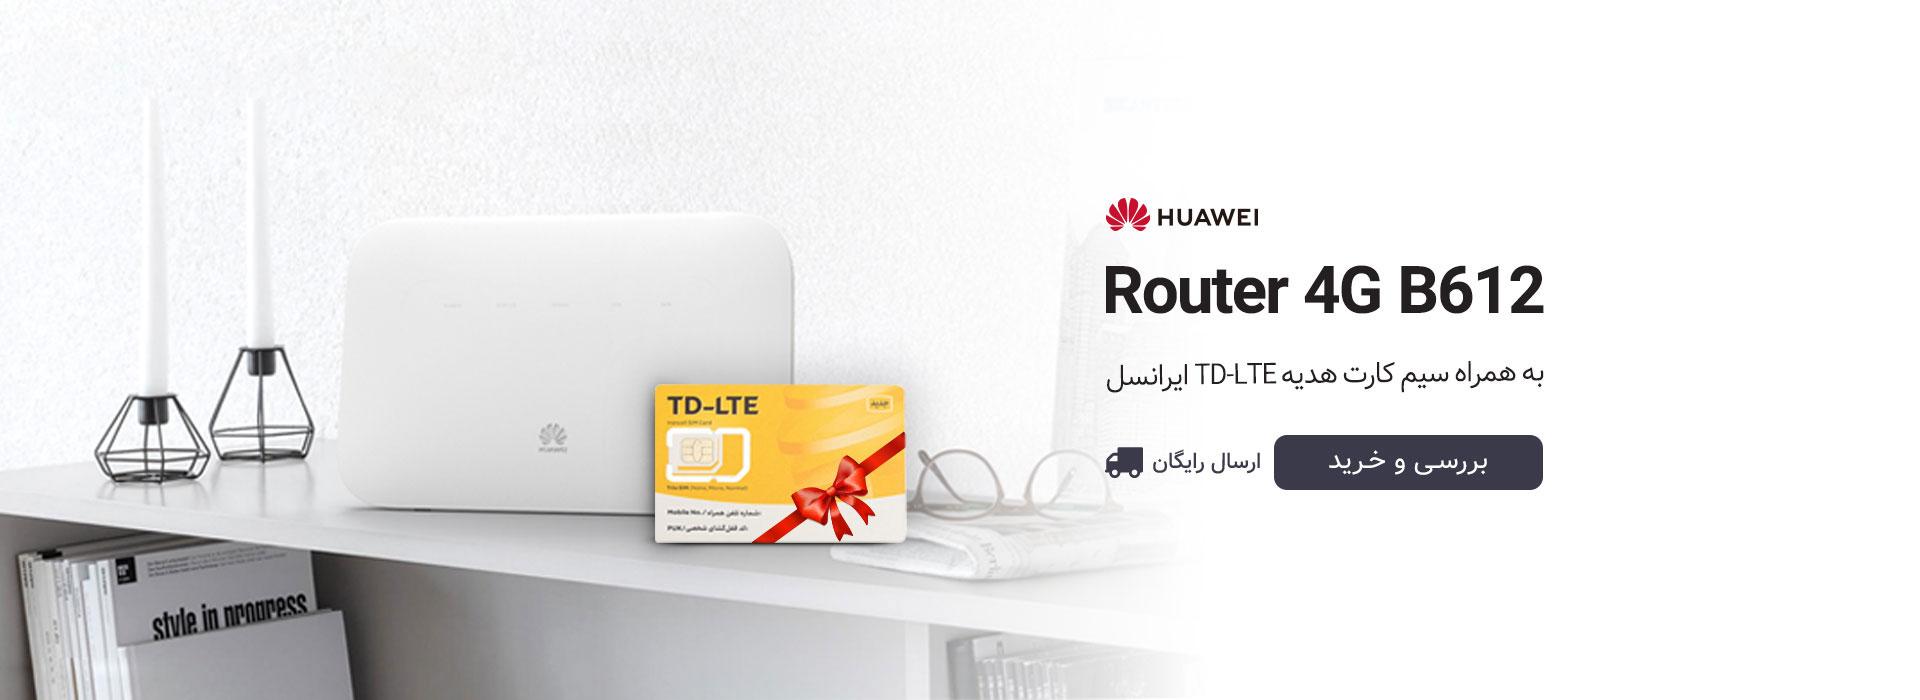 مودم روتر HUAWEI 4G/TD-LTE مدل Router 2 Pro B612